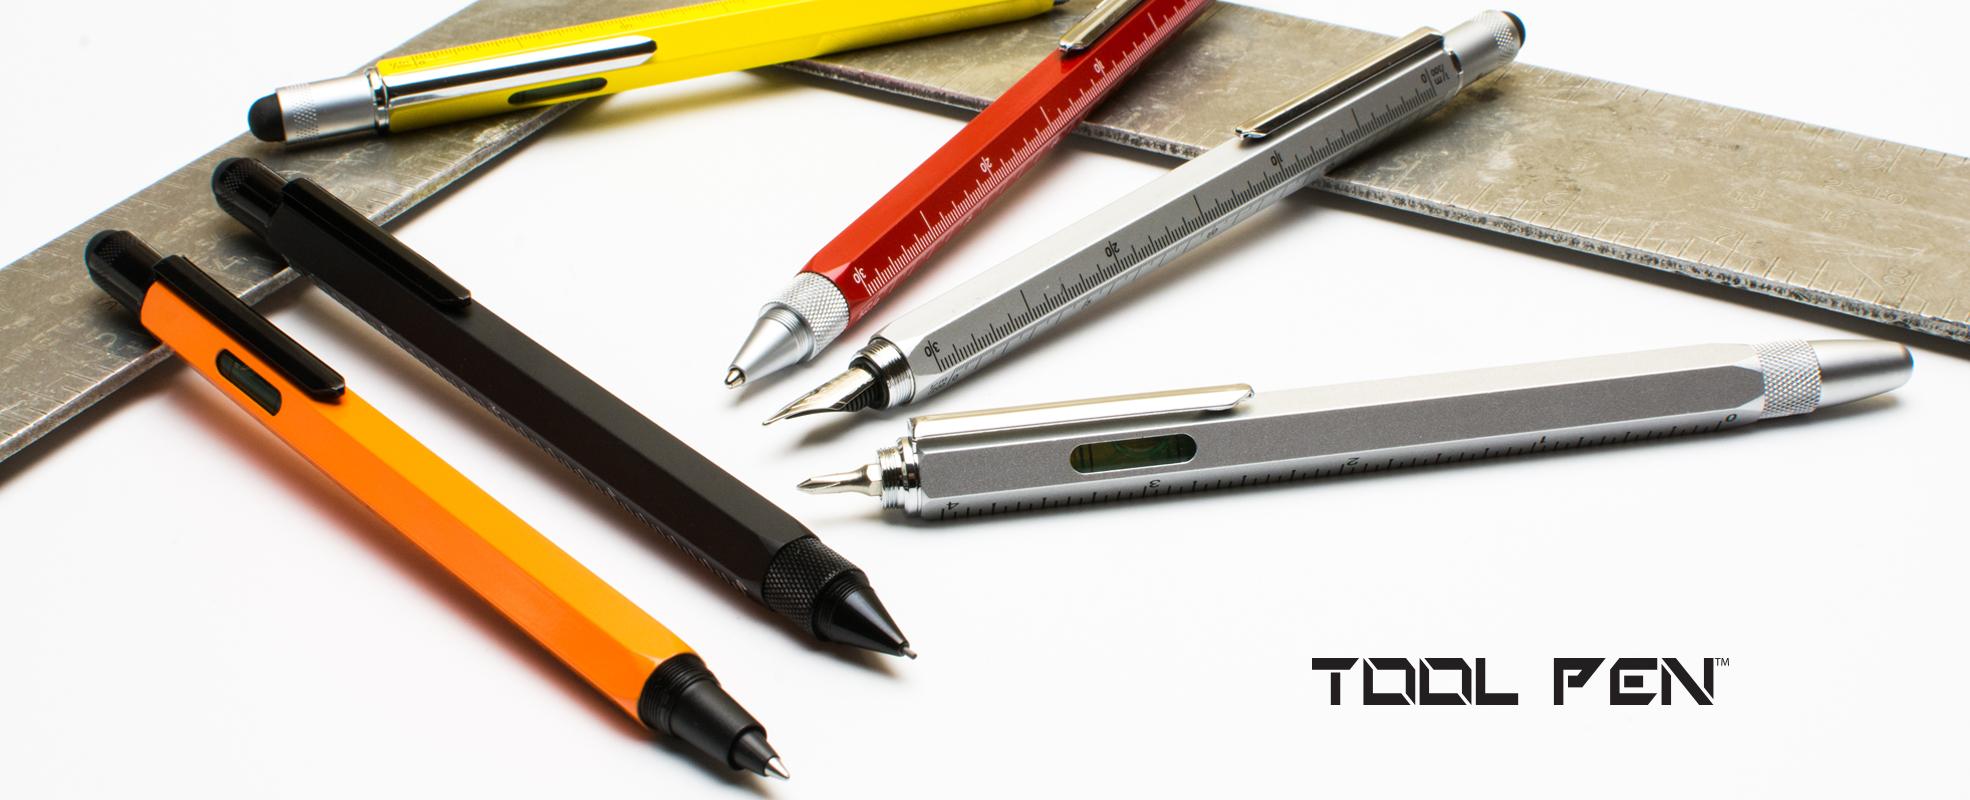 tool-pen-banner-big-commerce.jpg